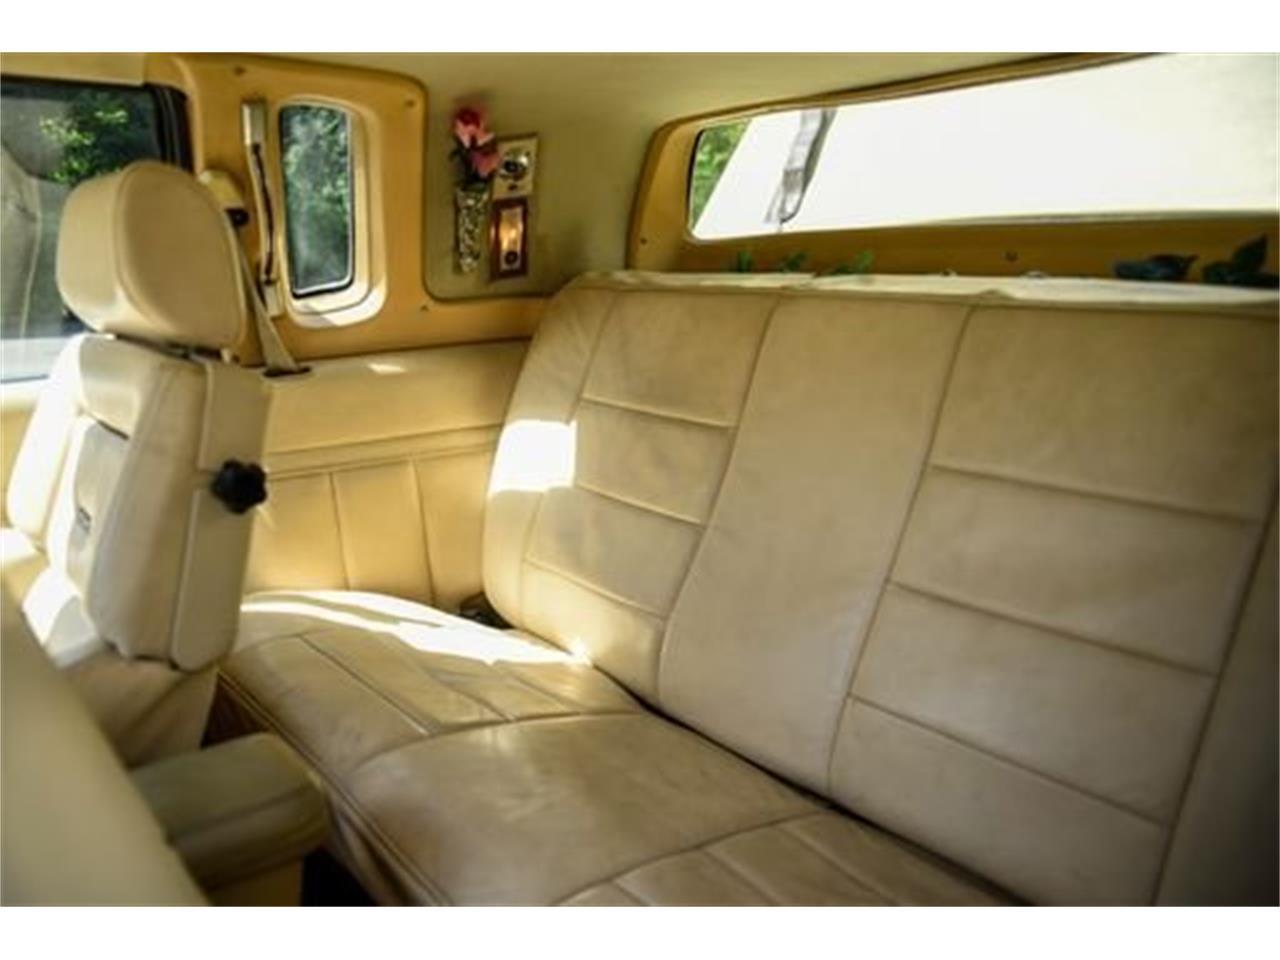 1982 Zimmer Golden Spirit (CC-1390334) for sale in Saratoga Springs, New York